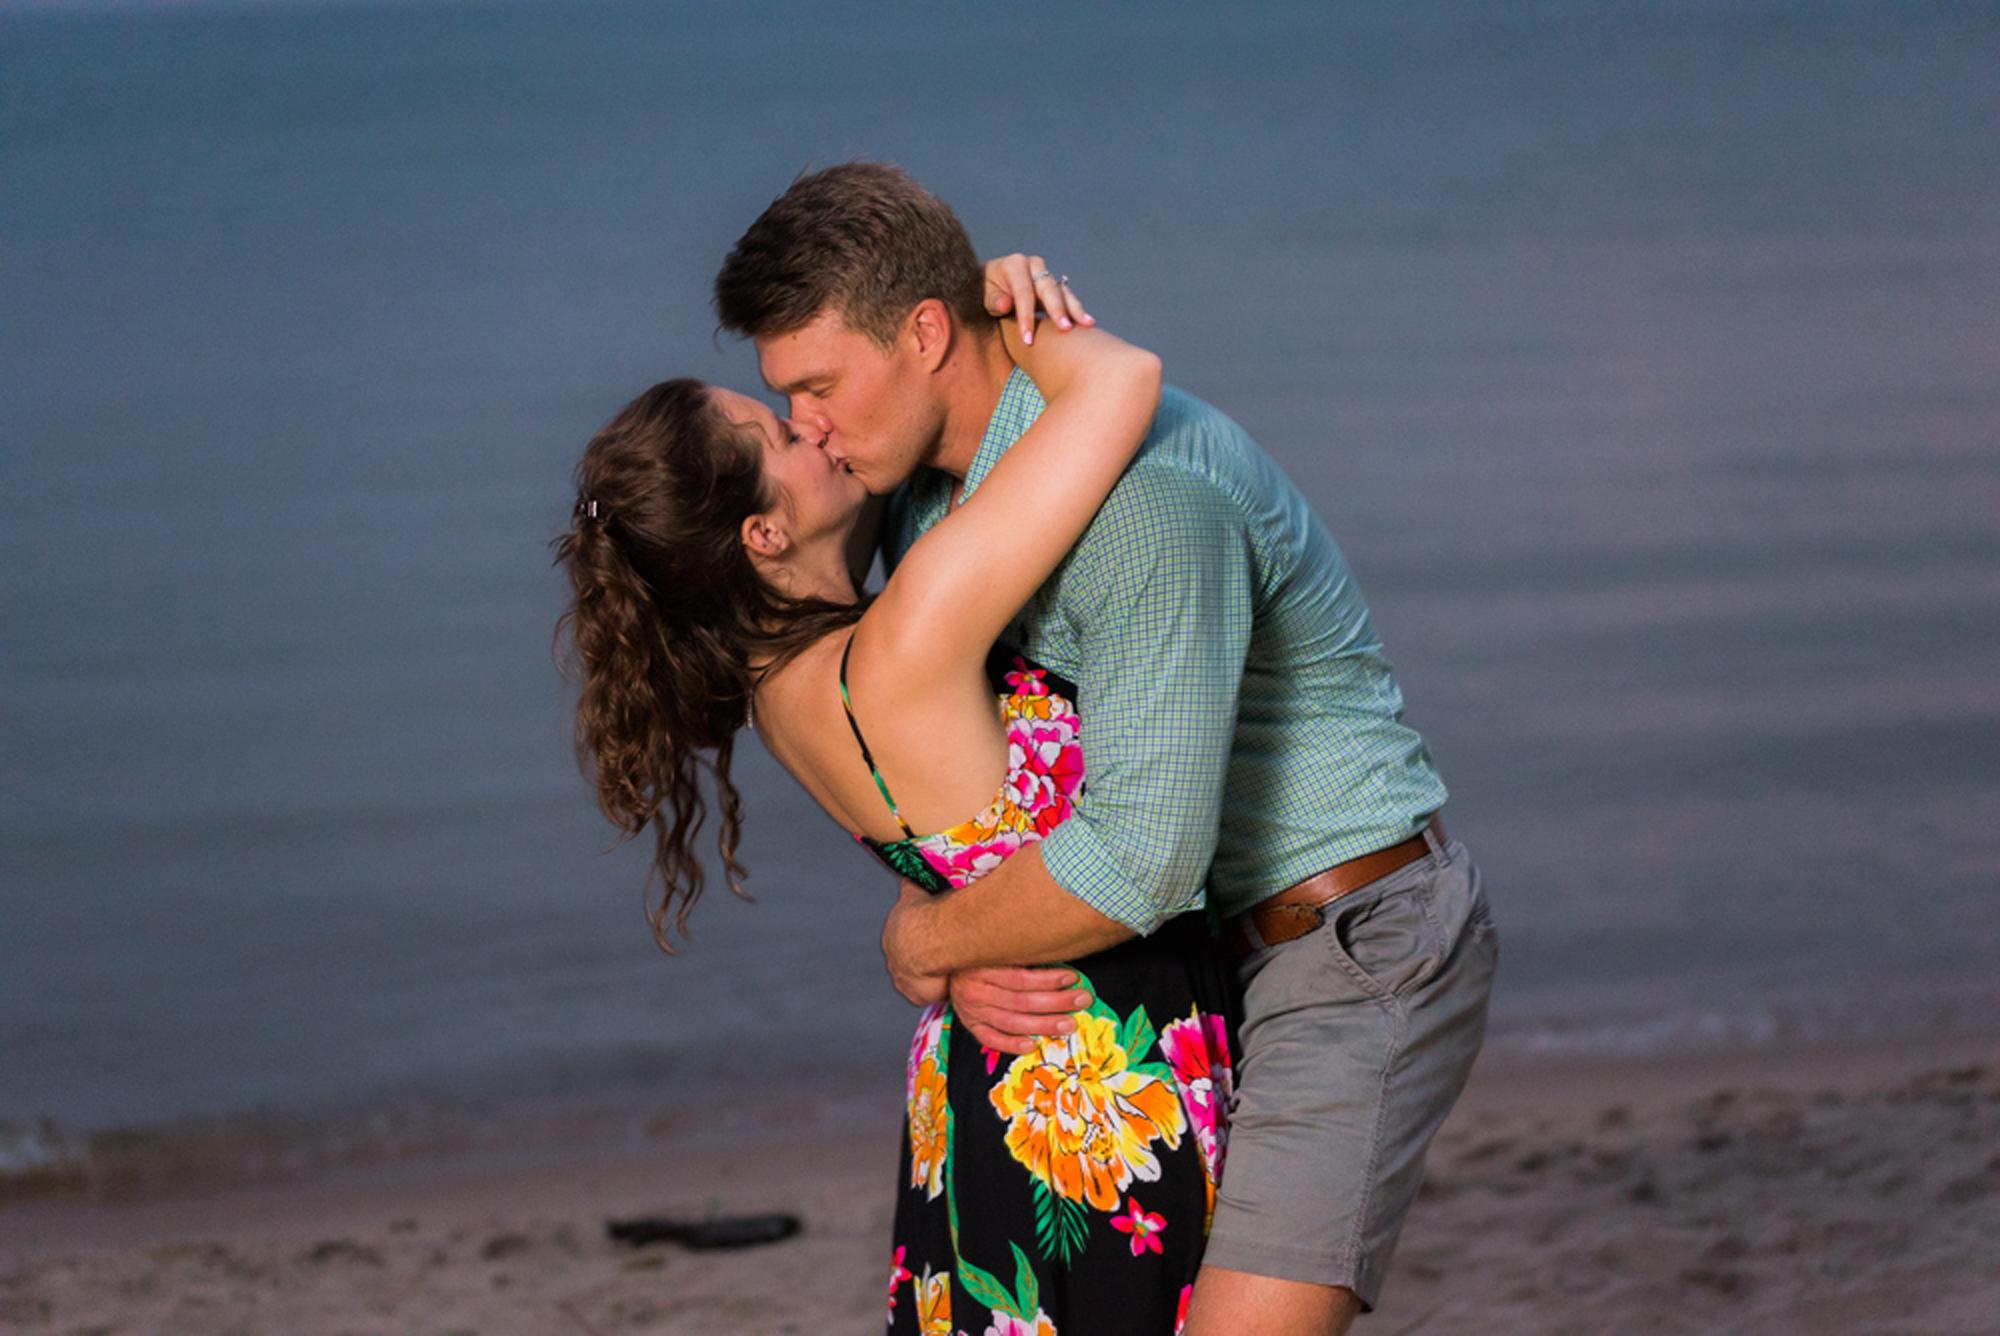 south-haven-michigan-beach-engagement-proposal-photographer-sydney-marie (18).jpg